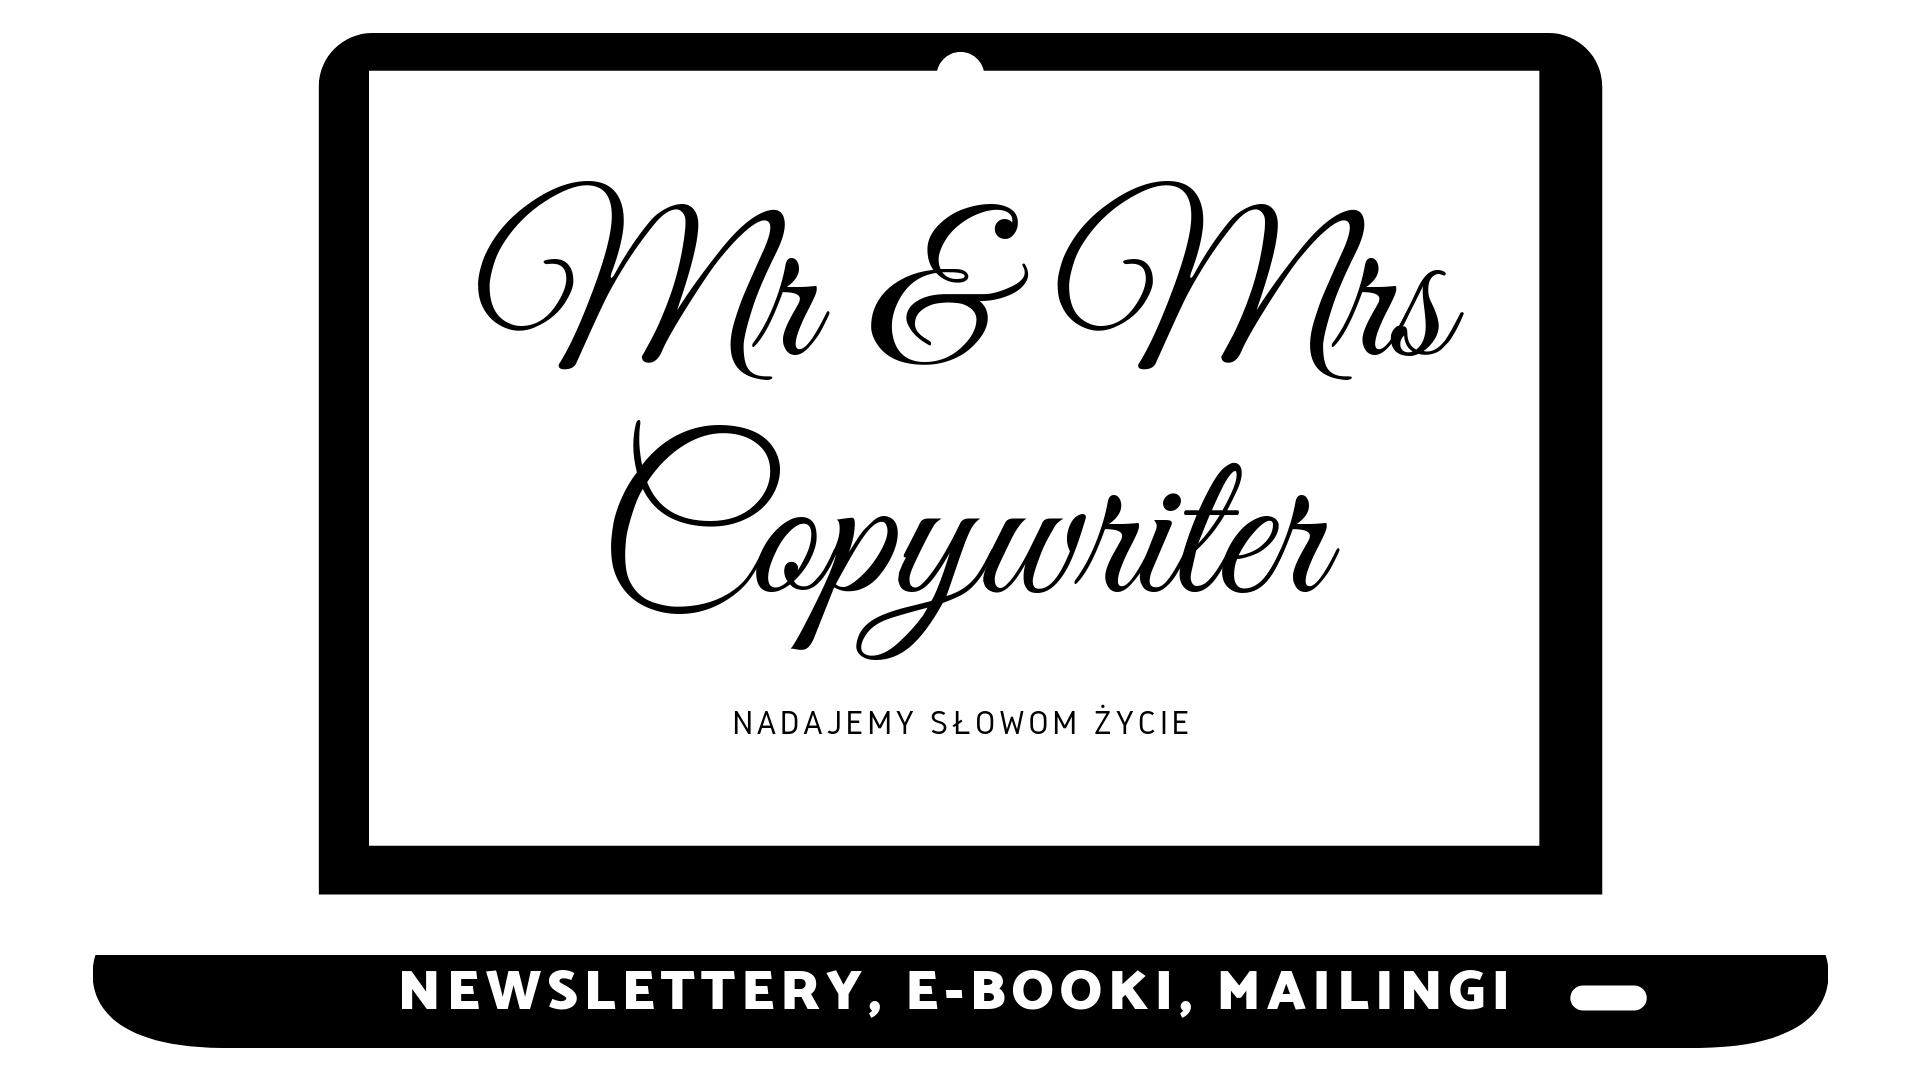 Newslettery, e-booki, mailingi - Copywriter